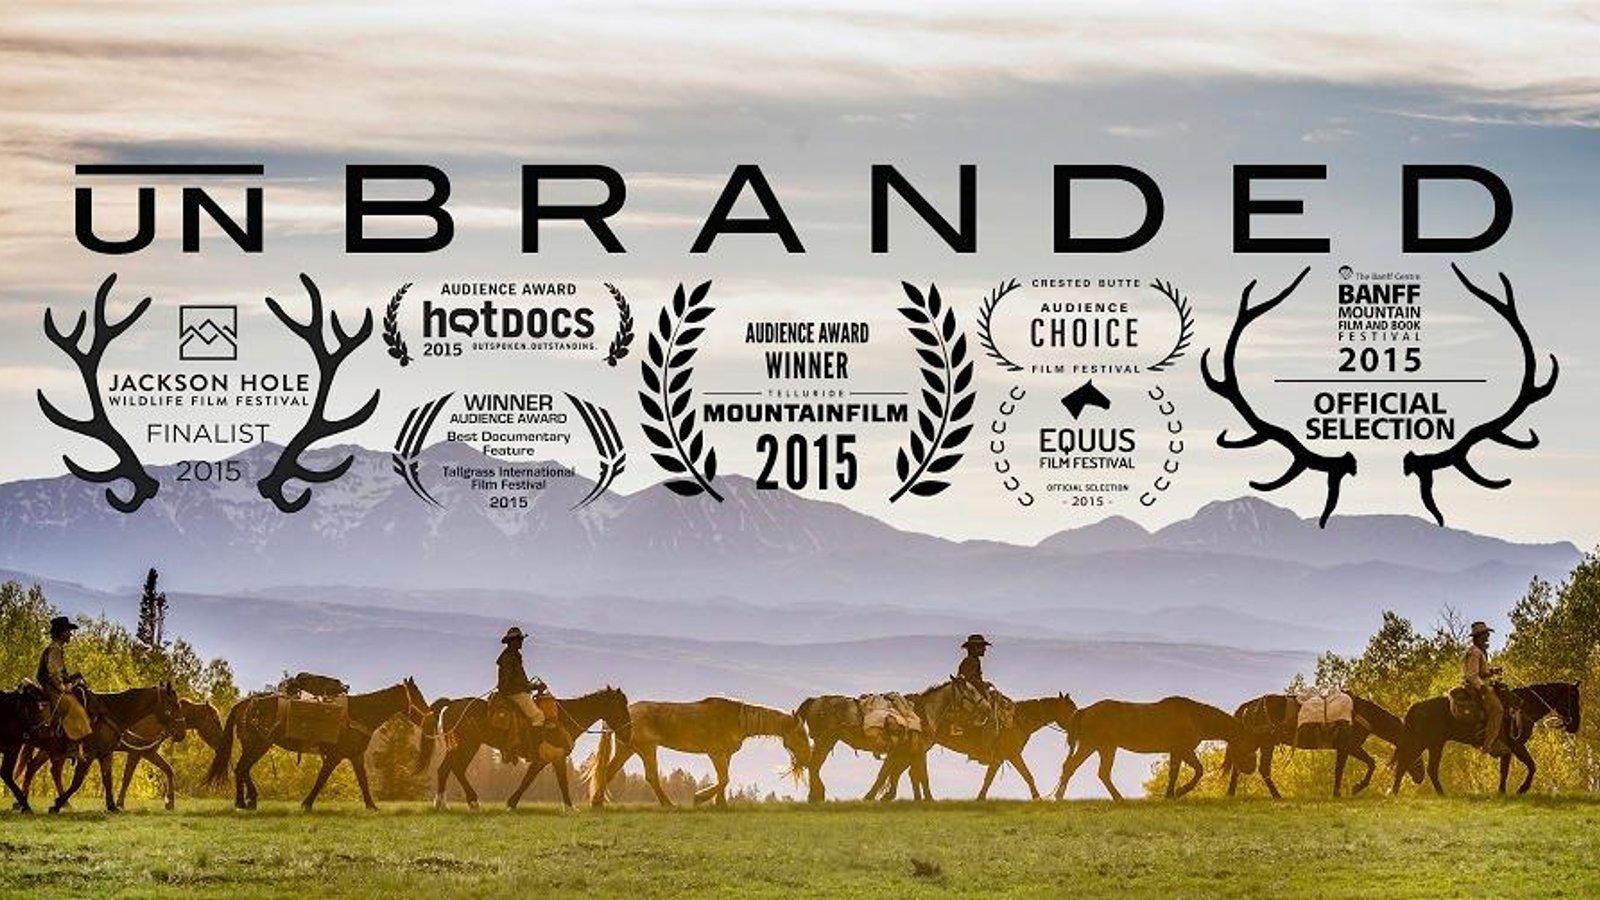 Unbranded - Inspiring Adoption of Wild Horses